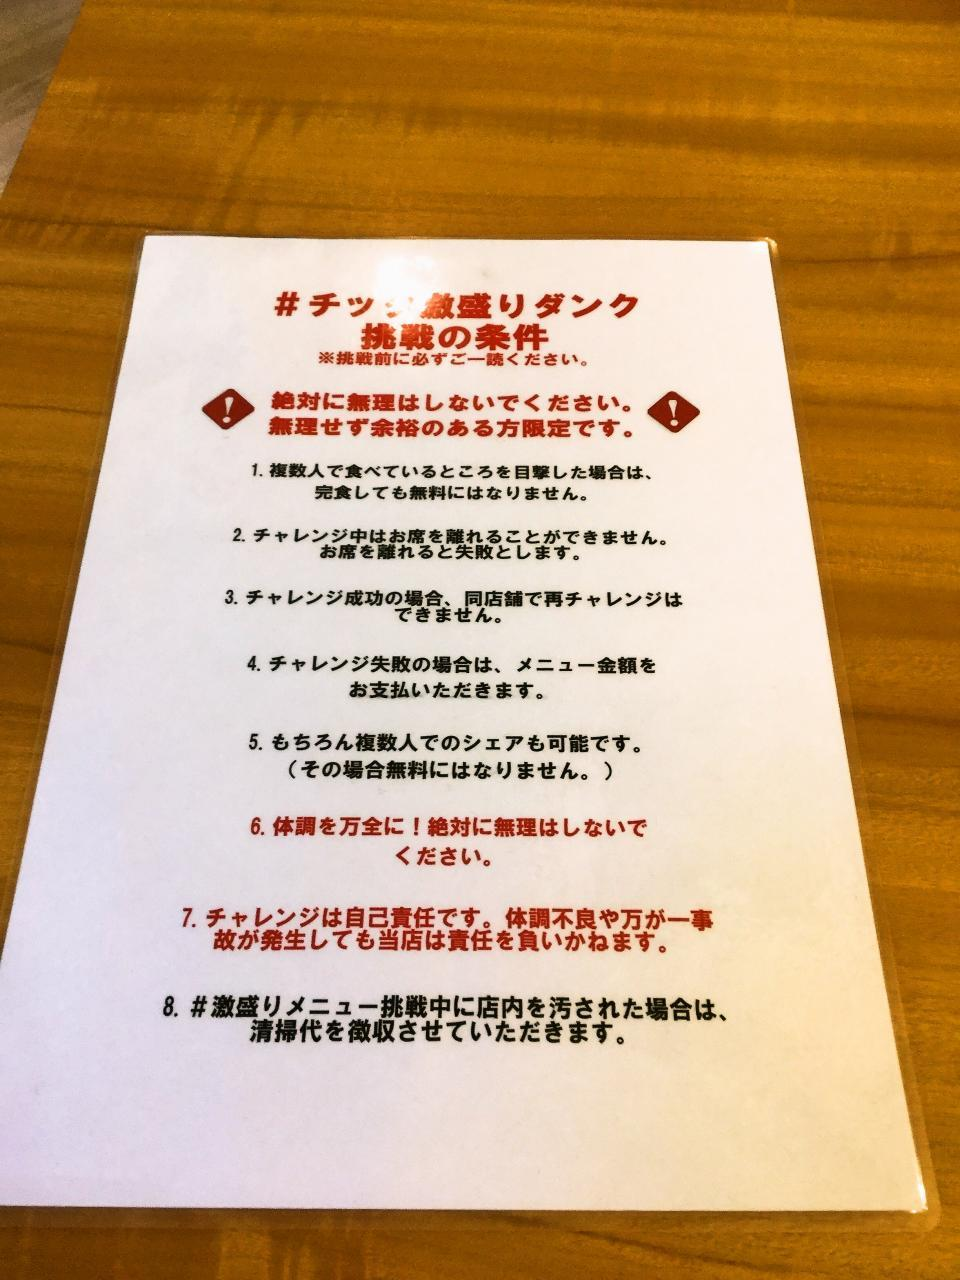 TABLE895 ラ チッタデッラ店(チャレンジメニュー)